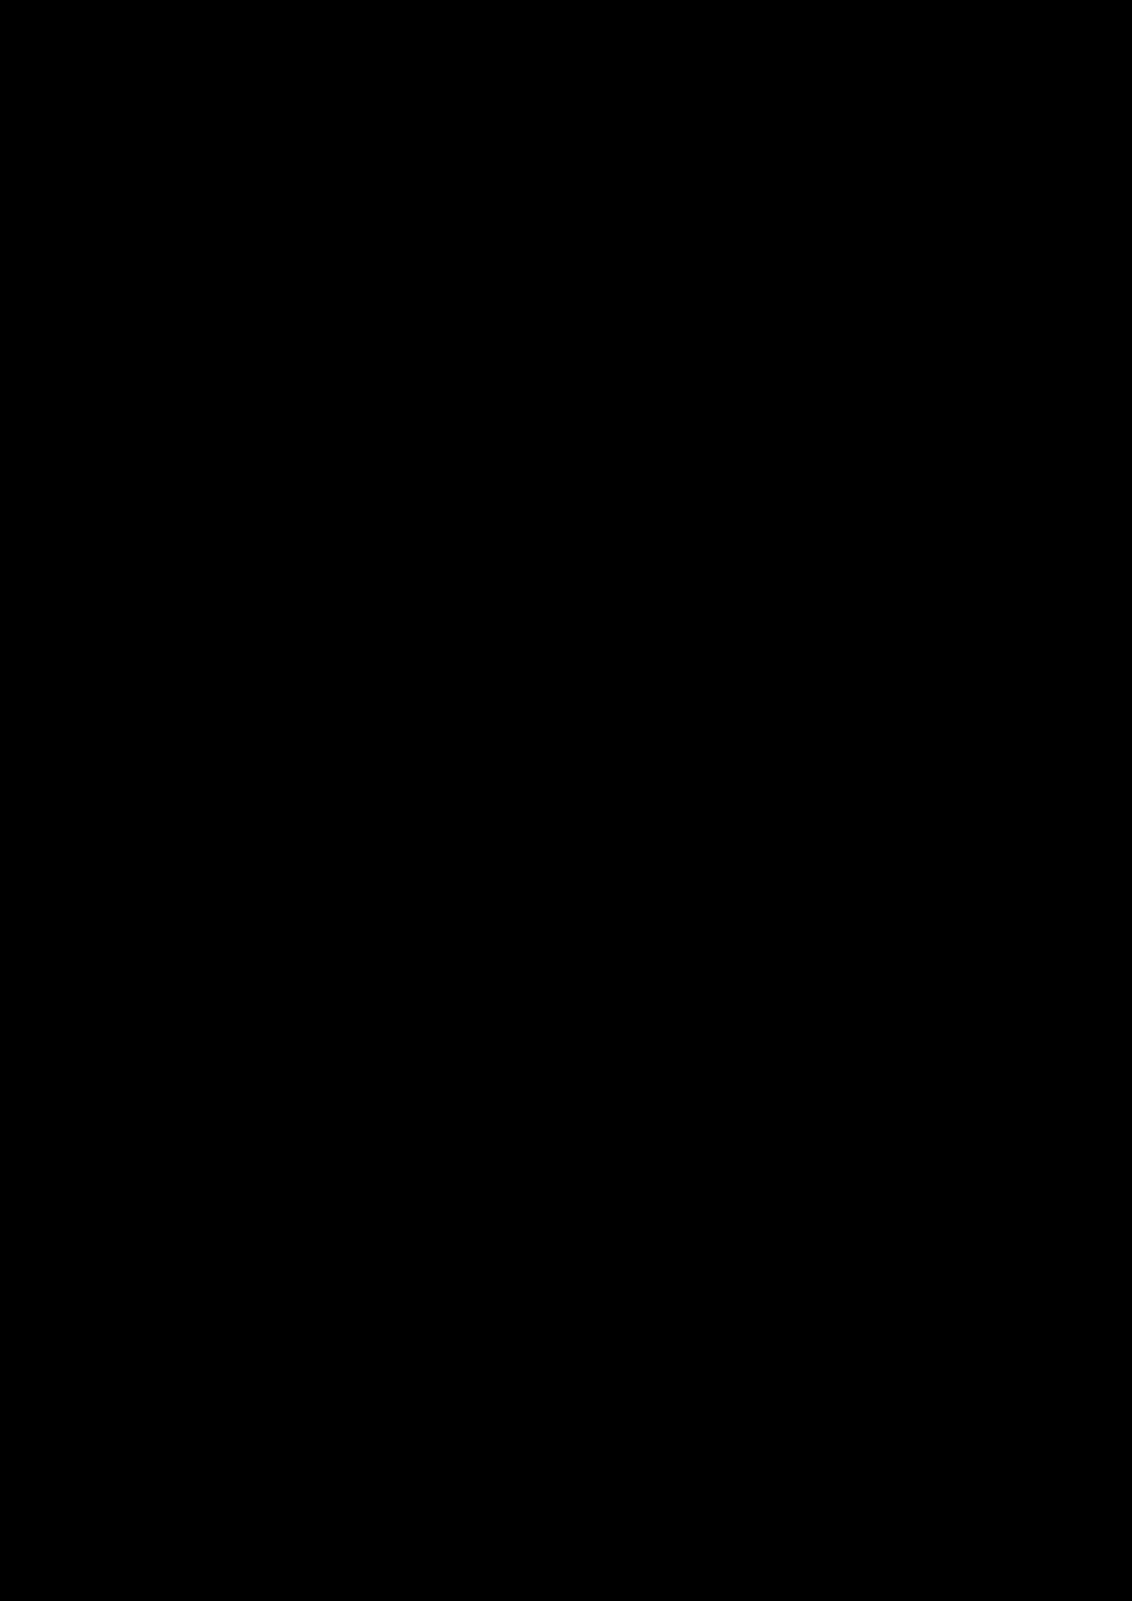 Belyiy sokol slide, Image 154